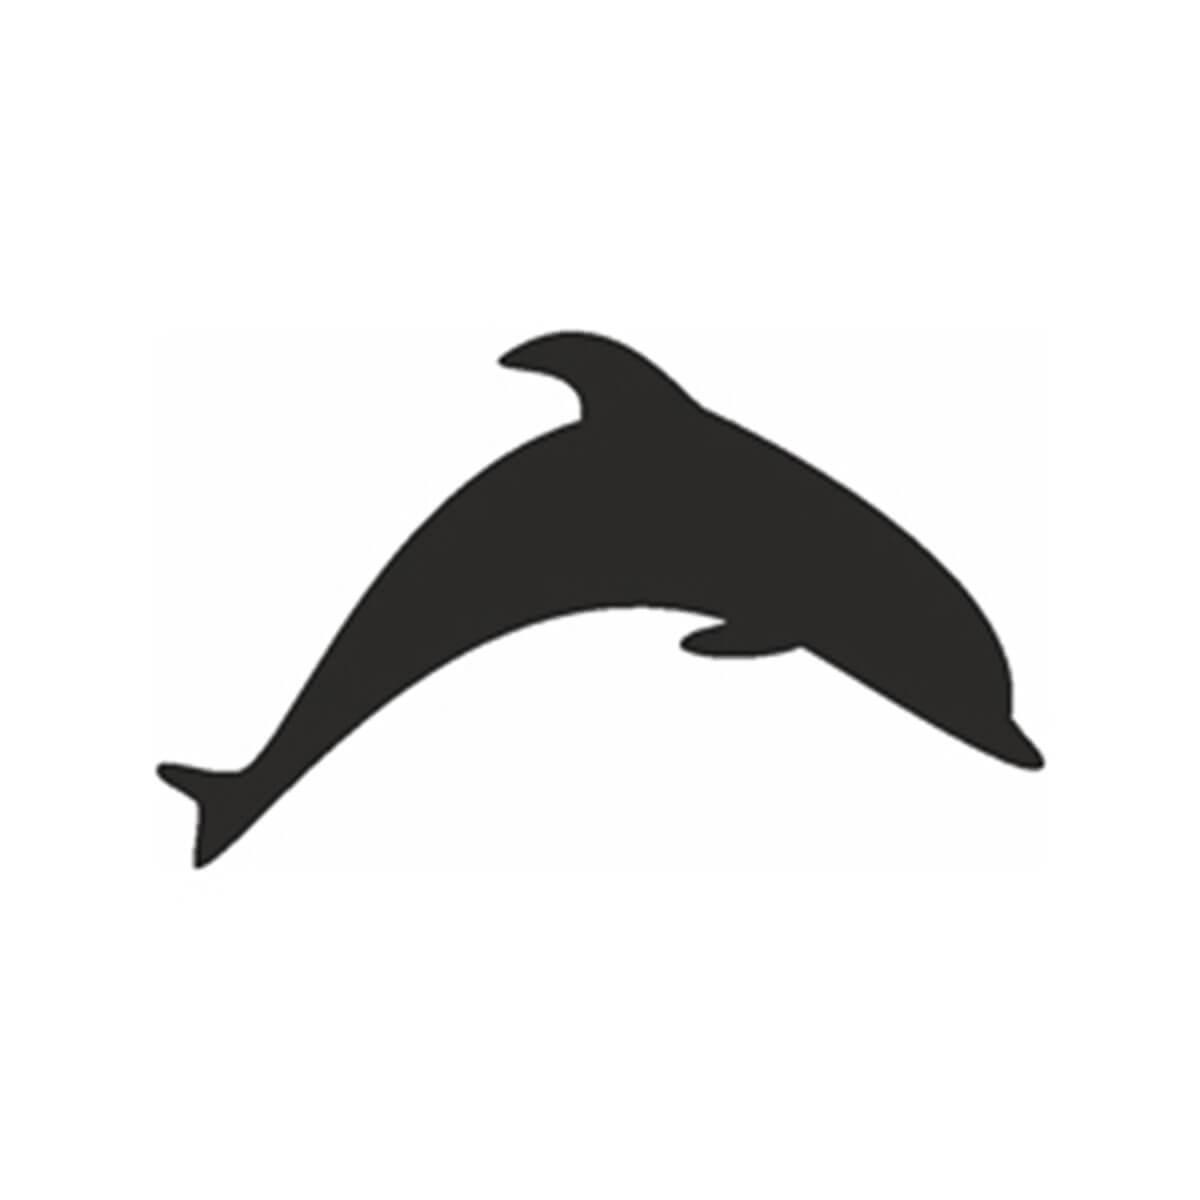 Selbstklebende Schablone Delphin in Delfin Schablone